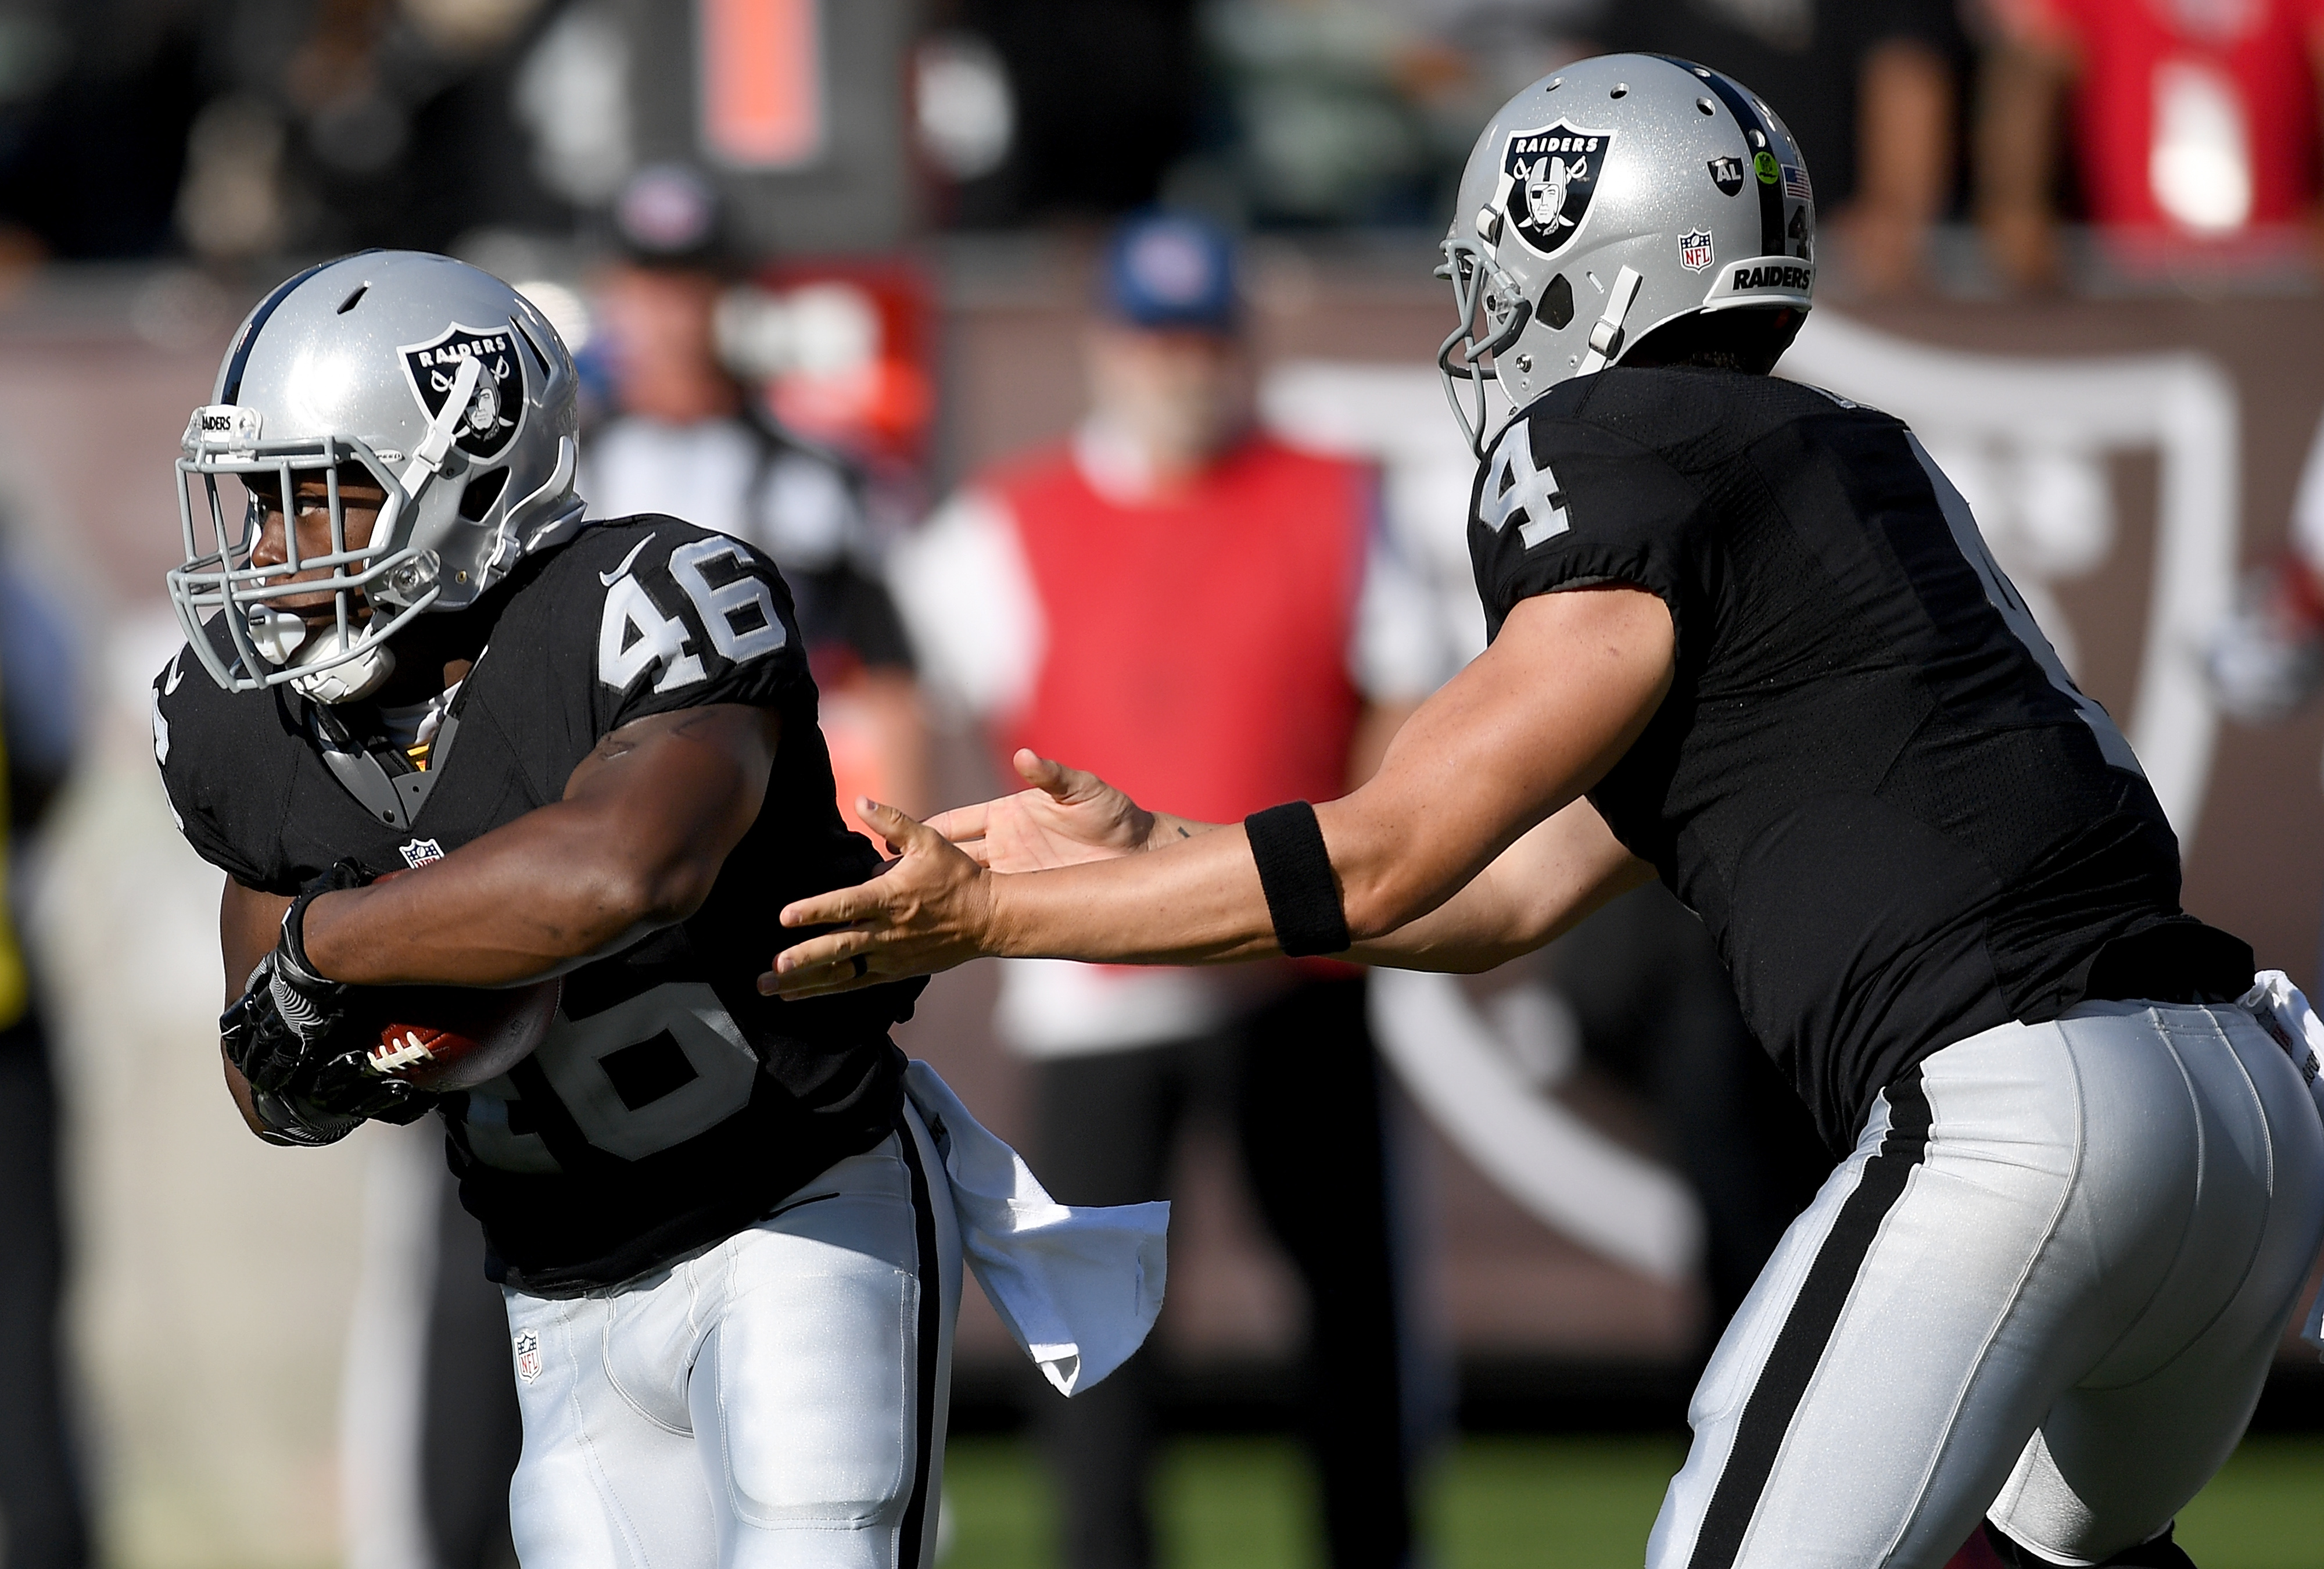 Raiders' Jalen Richard Dices Up Saints for 75-Yard Touchdown (Video)